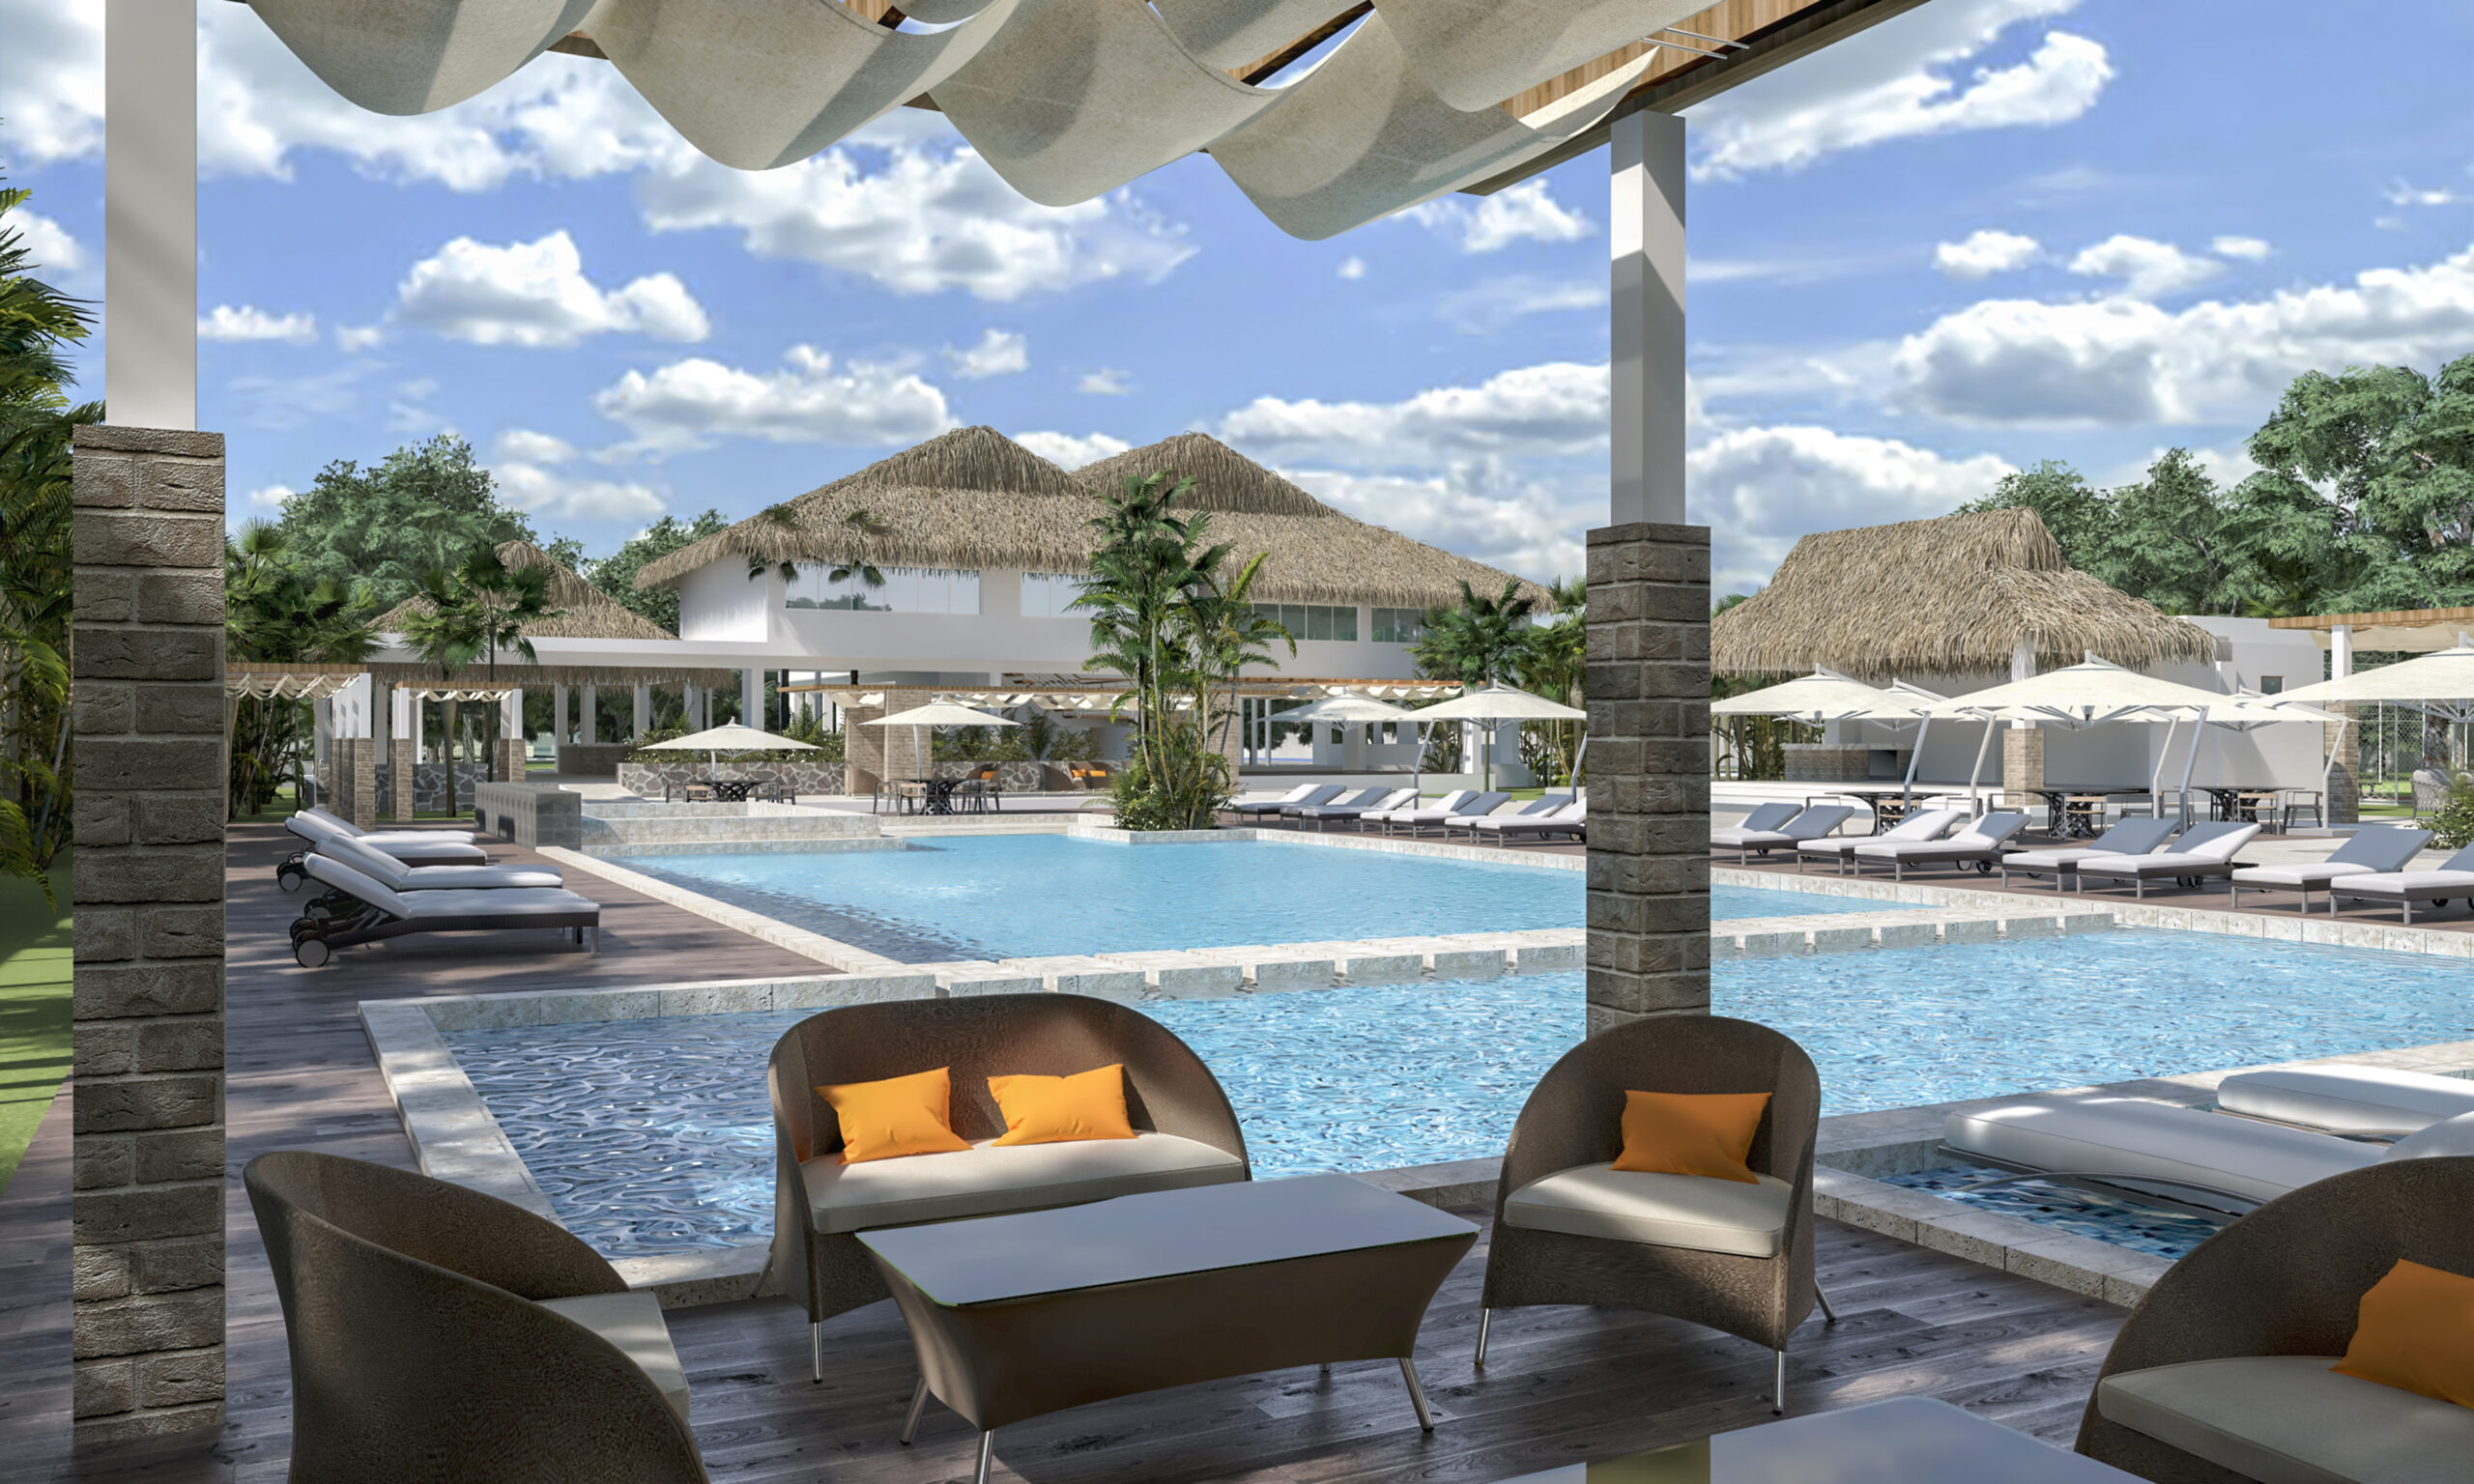 The Dominican Republic Real Estate Punta Cana